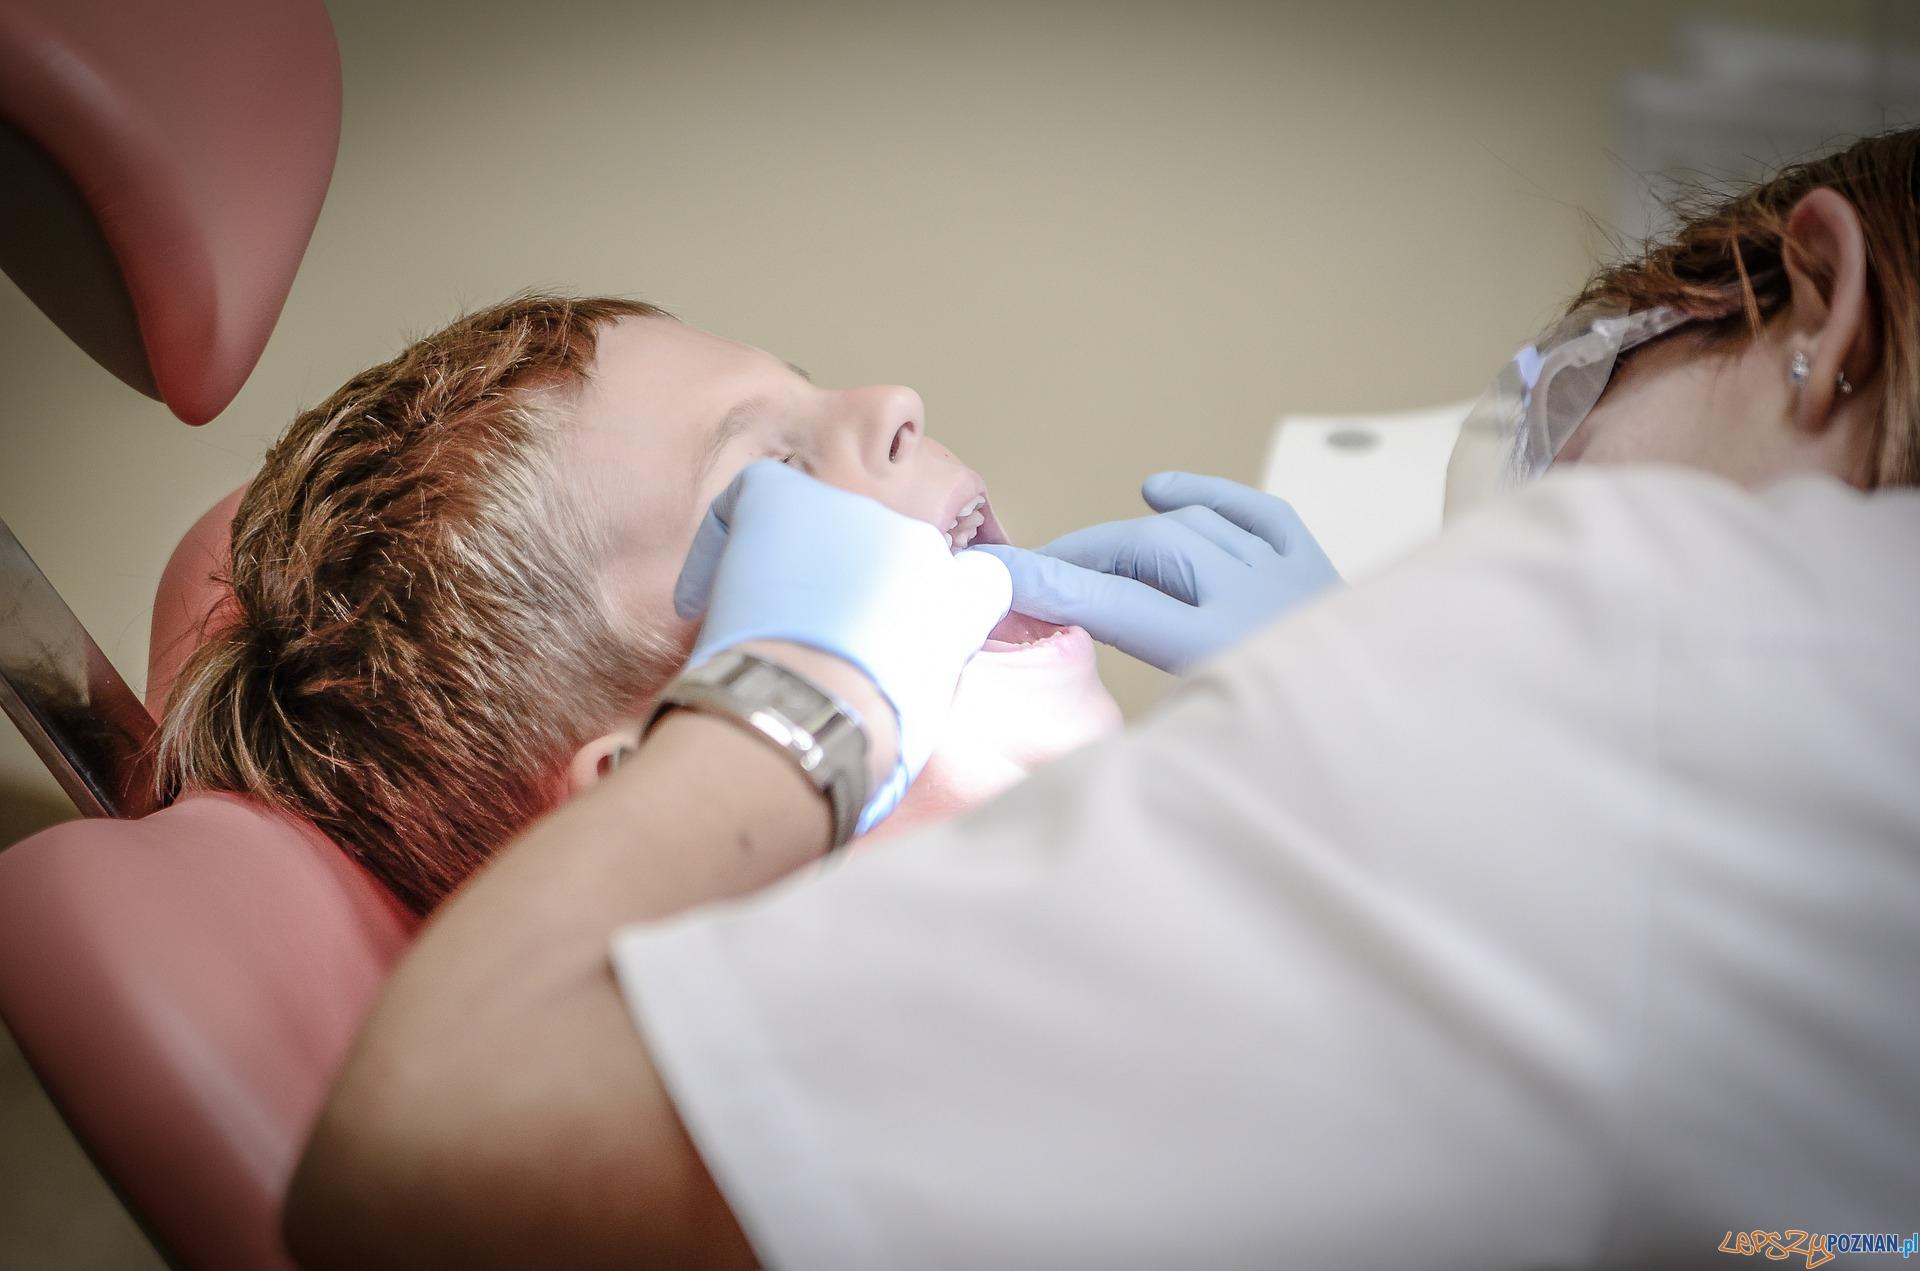 Dentysta  Foto: jarmoluk / CC